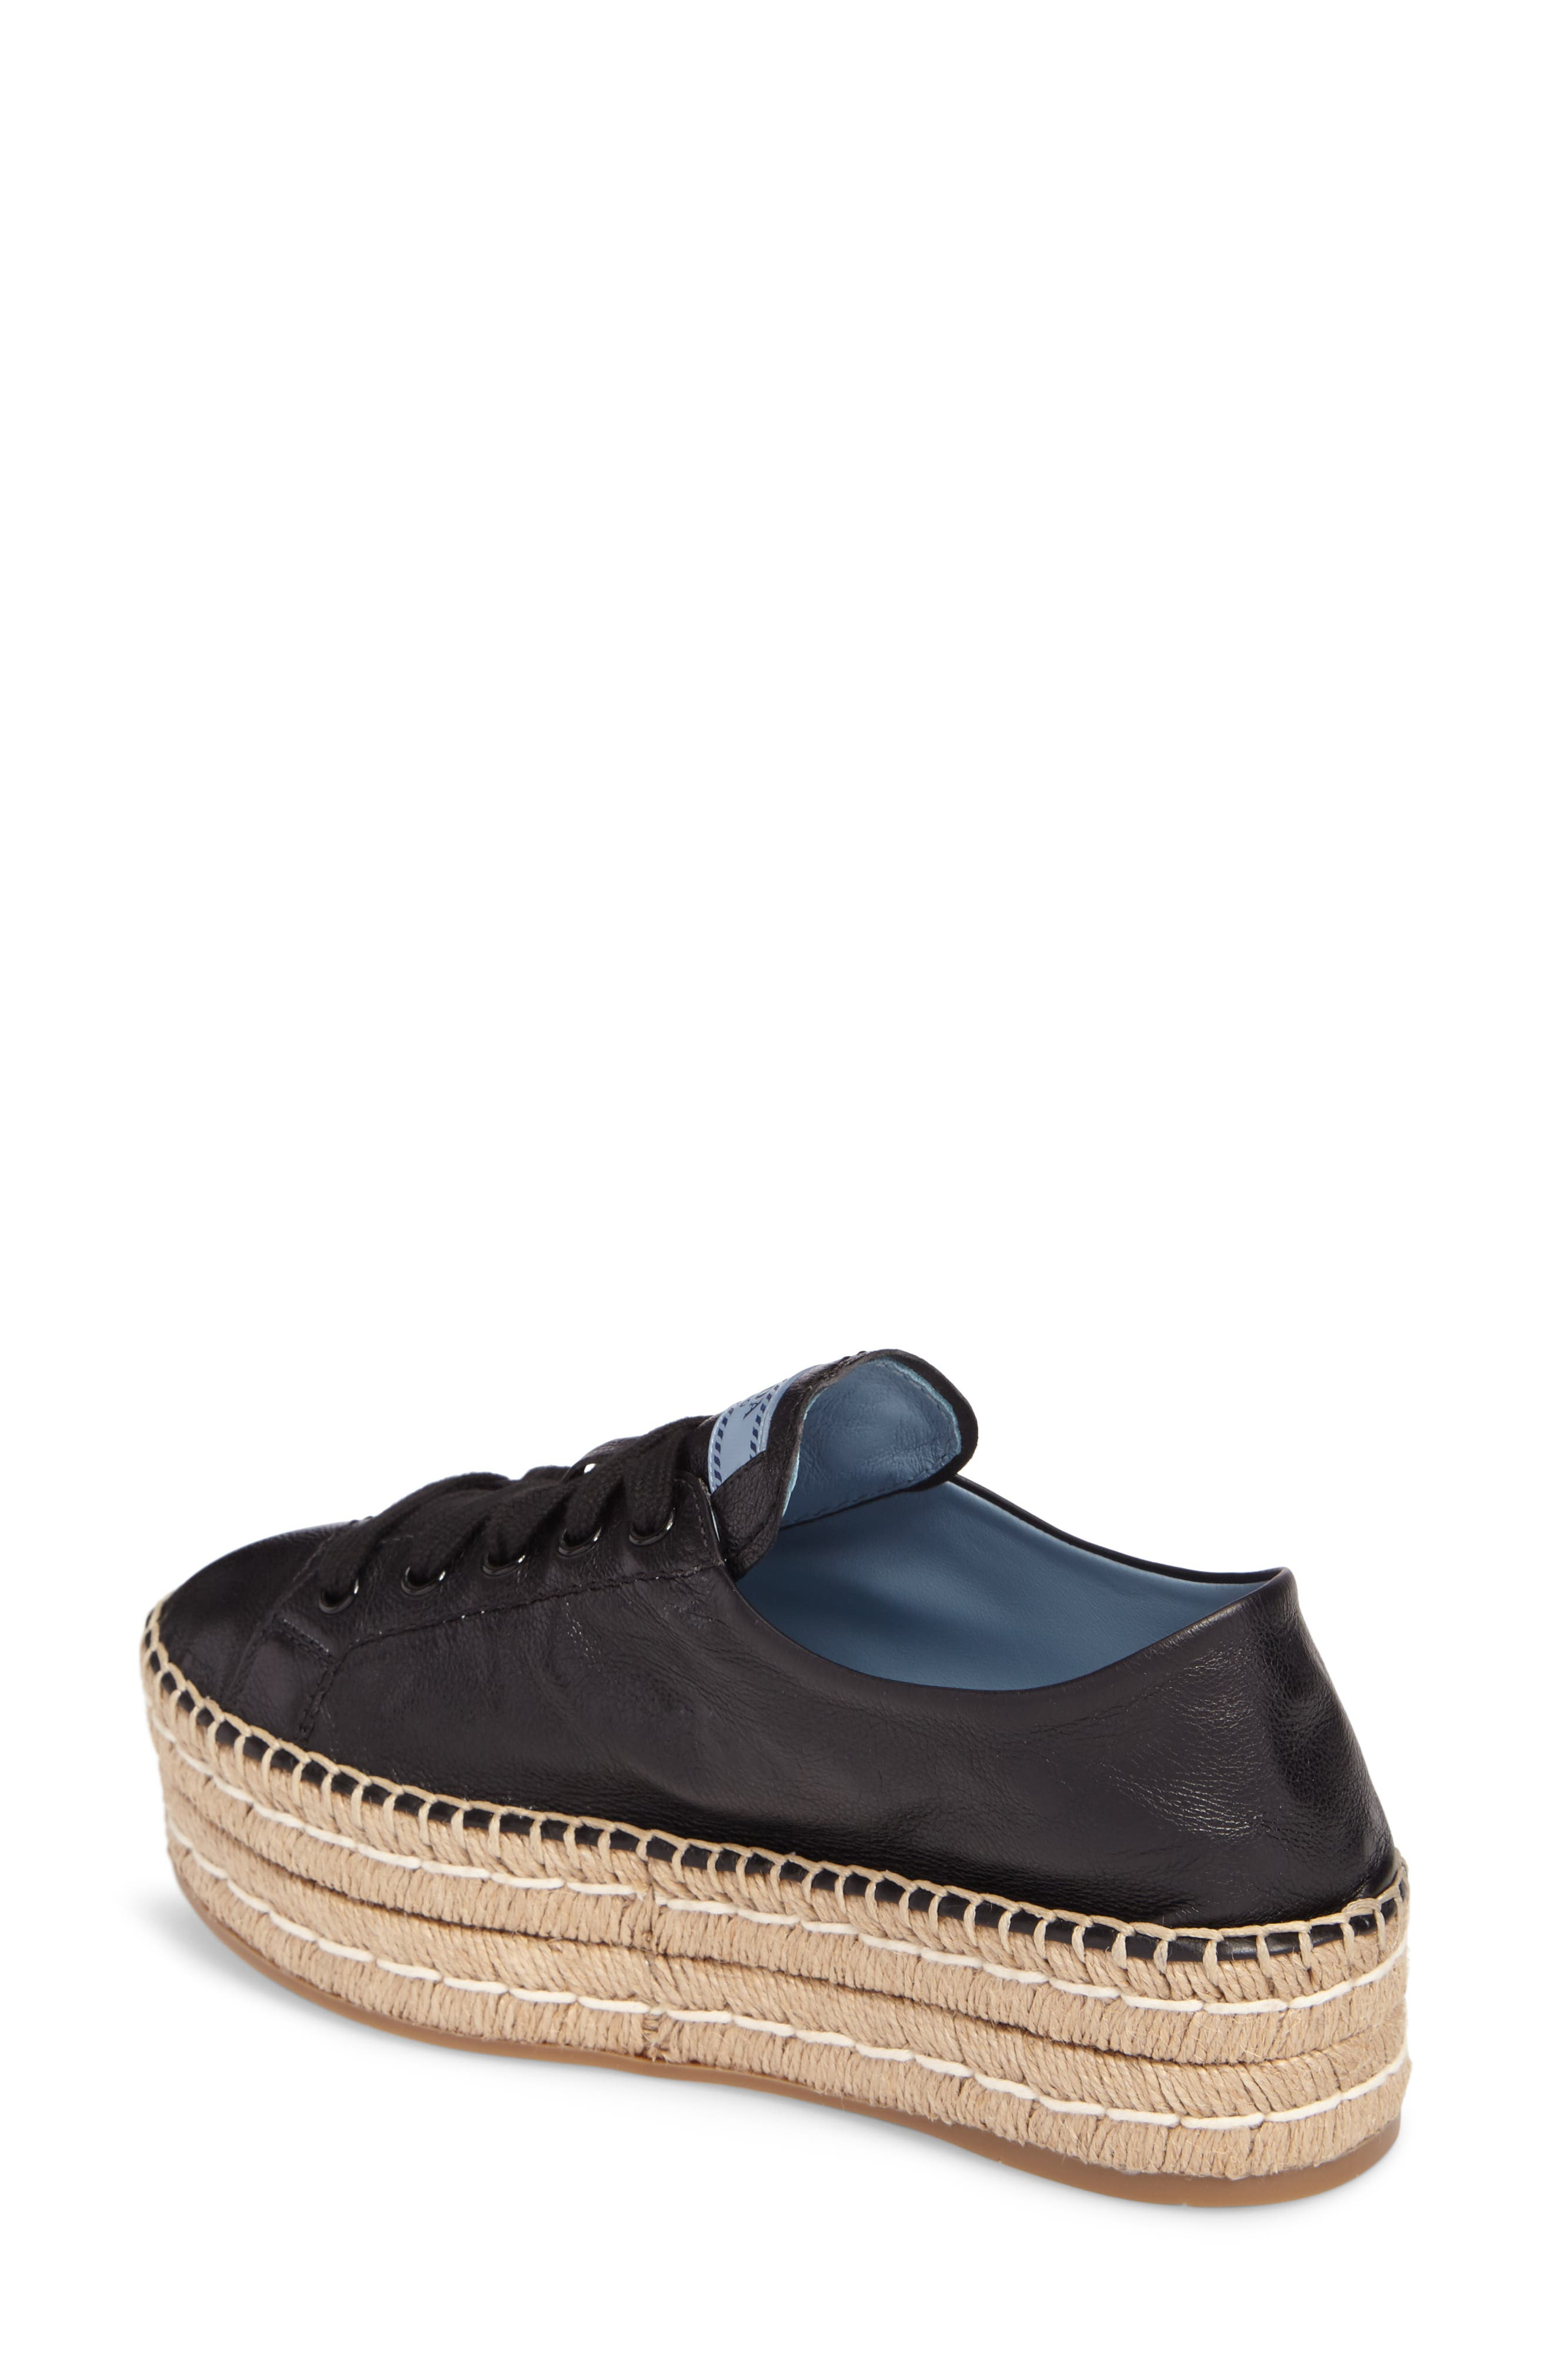 Flatform Espadrille Sneaker,                             Alternate thumbnail 2, color,                             Black